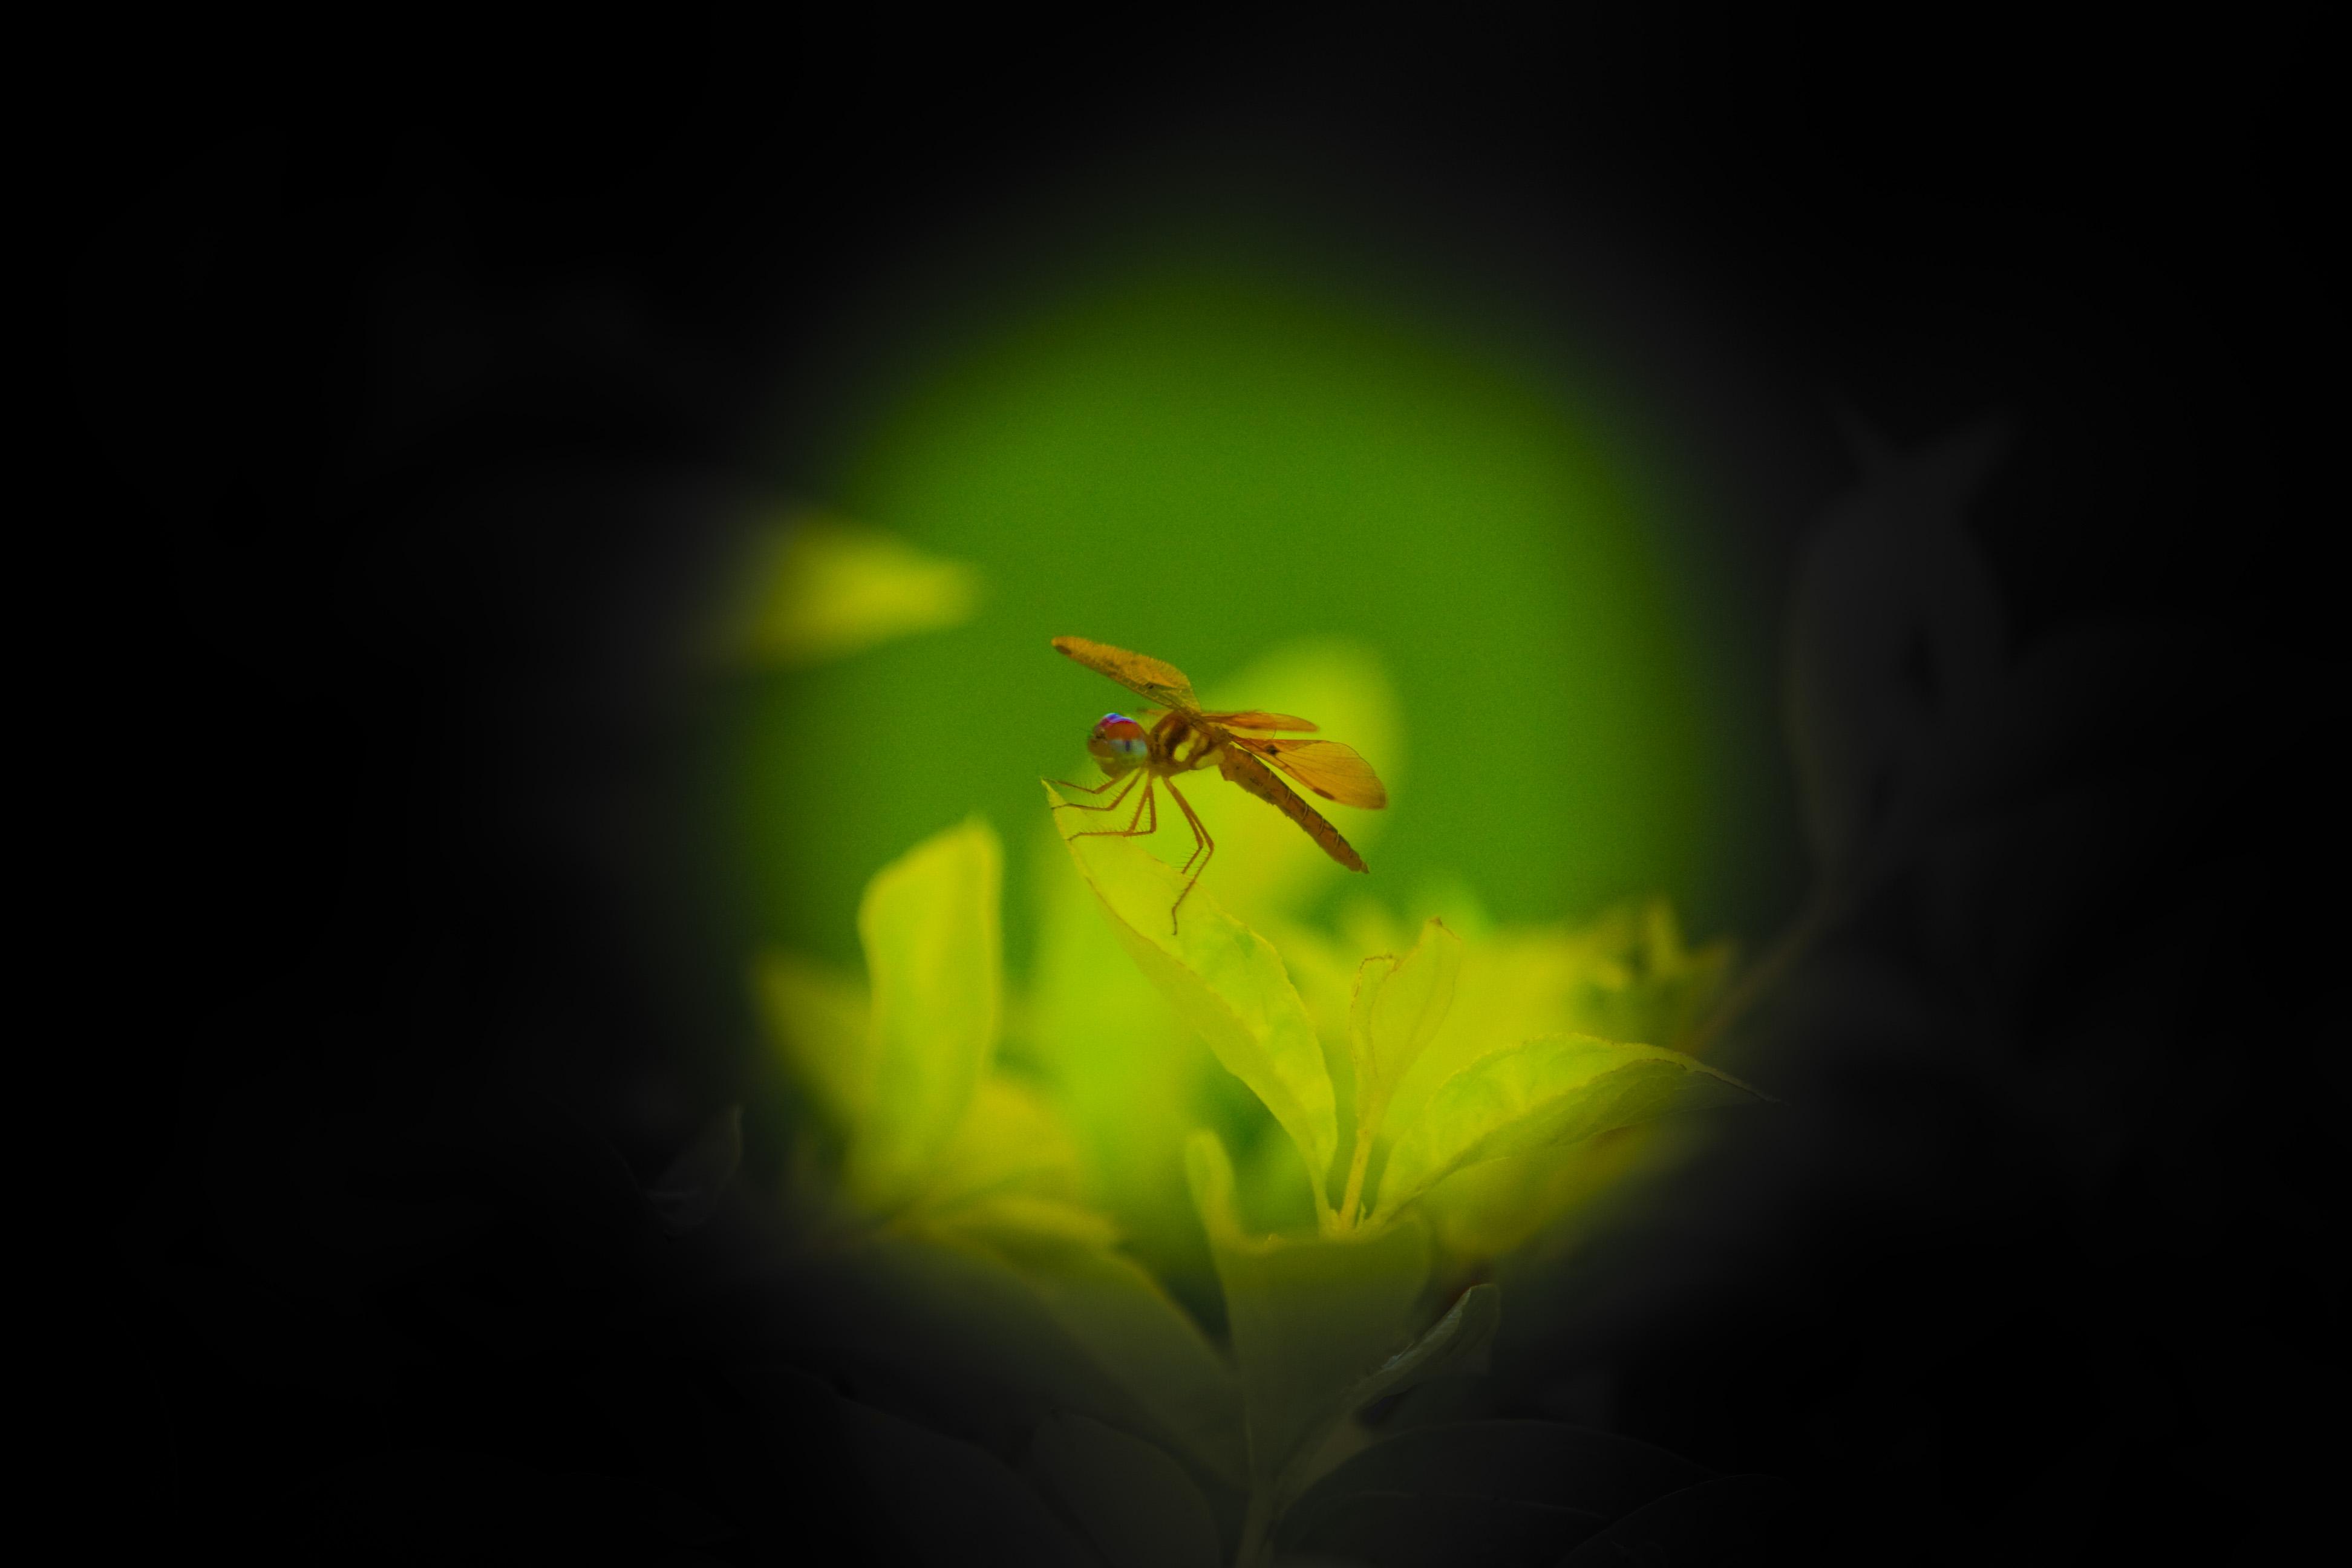 Bug View